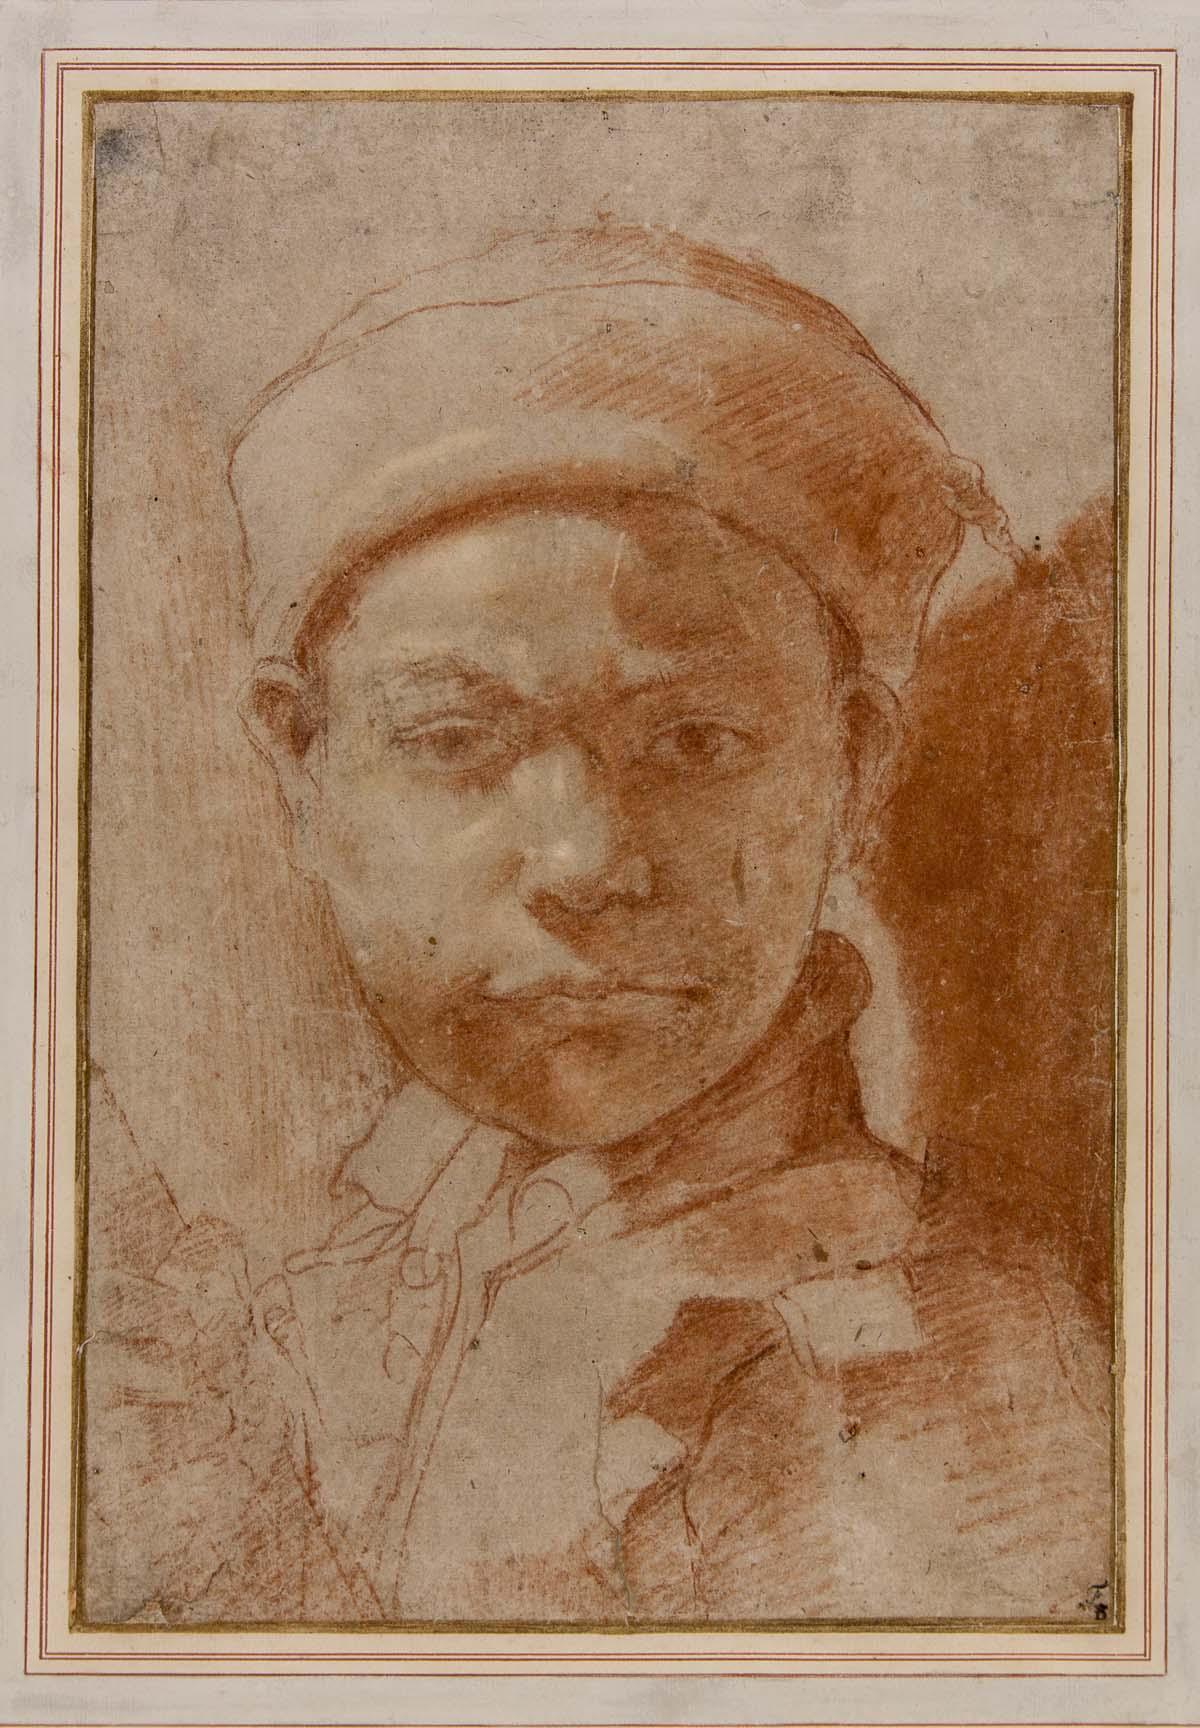 pencil portrait of a boy wearing a cap